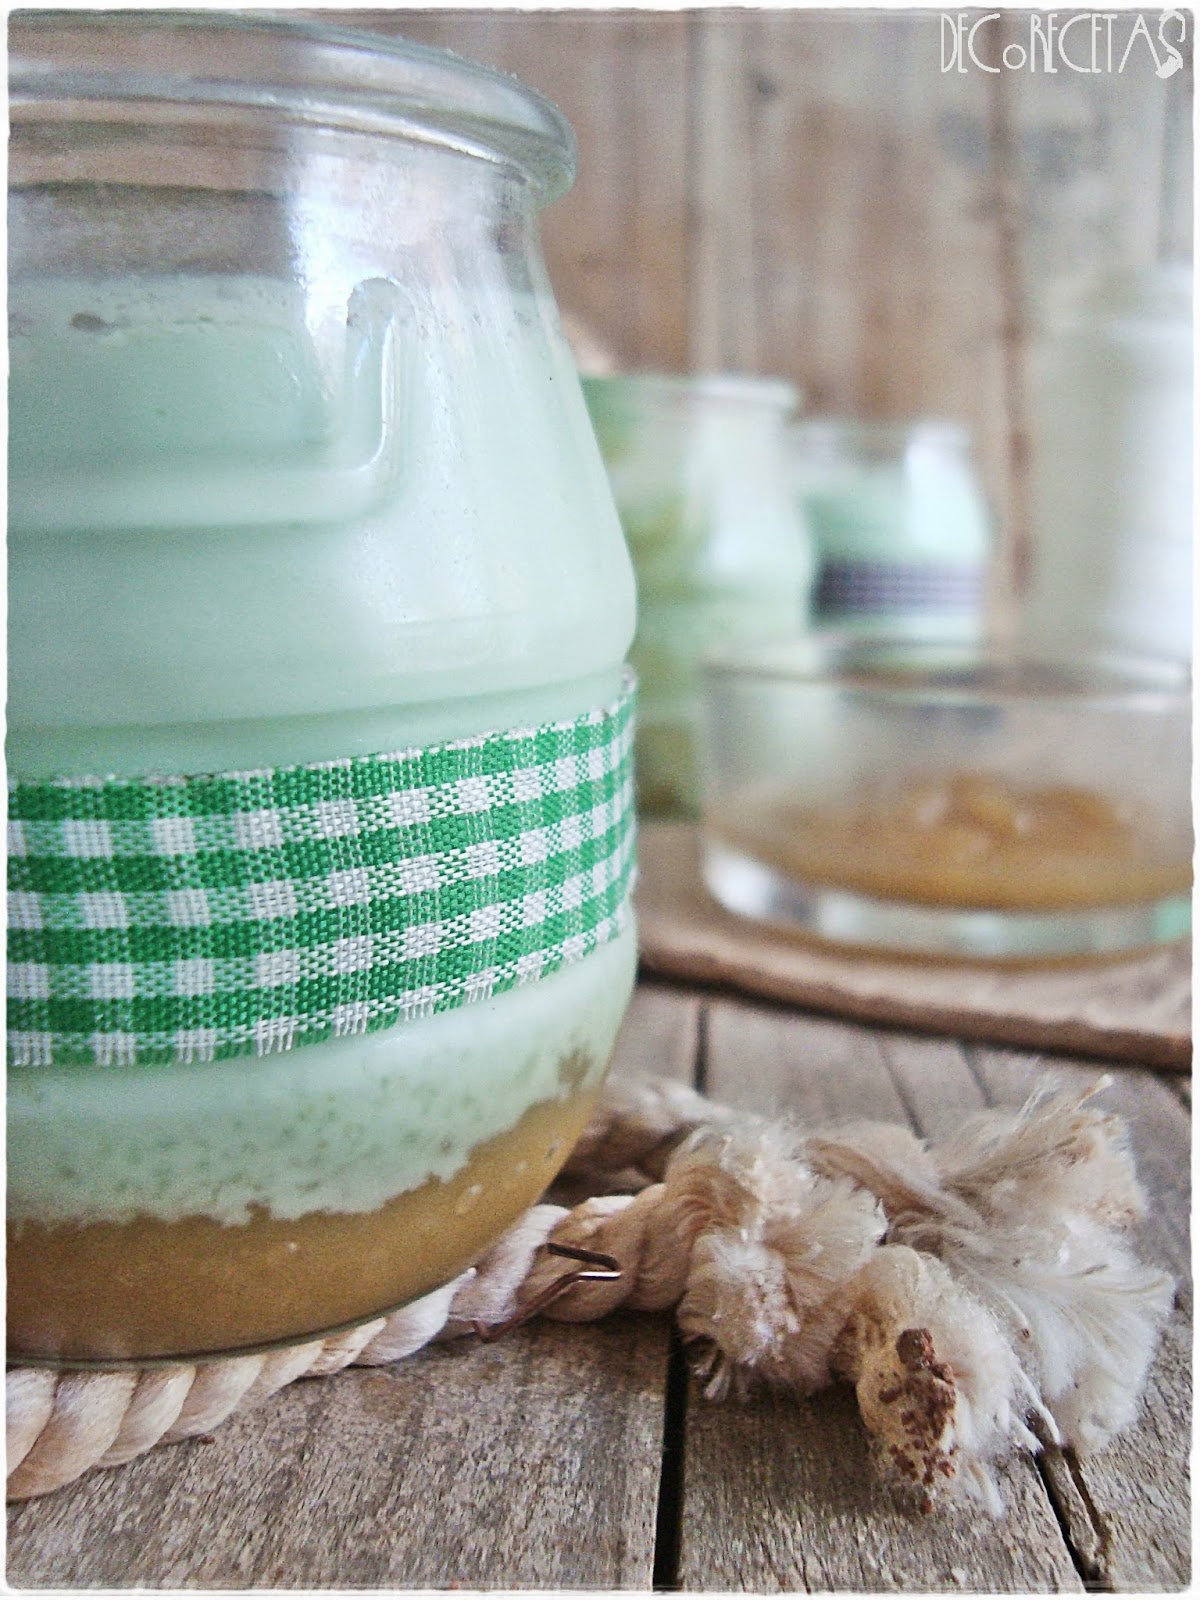 Yogures naturales con mermelada de pera (a la vainilla)